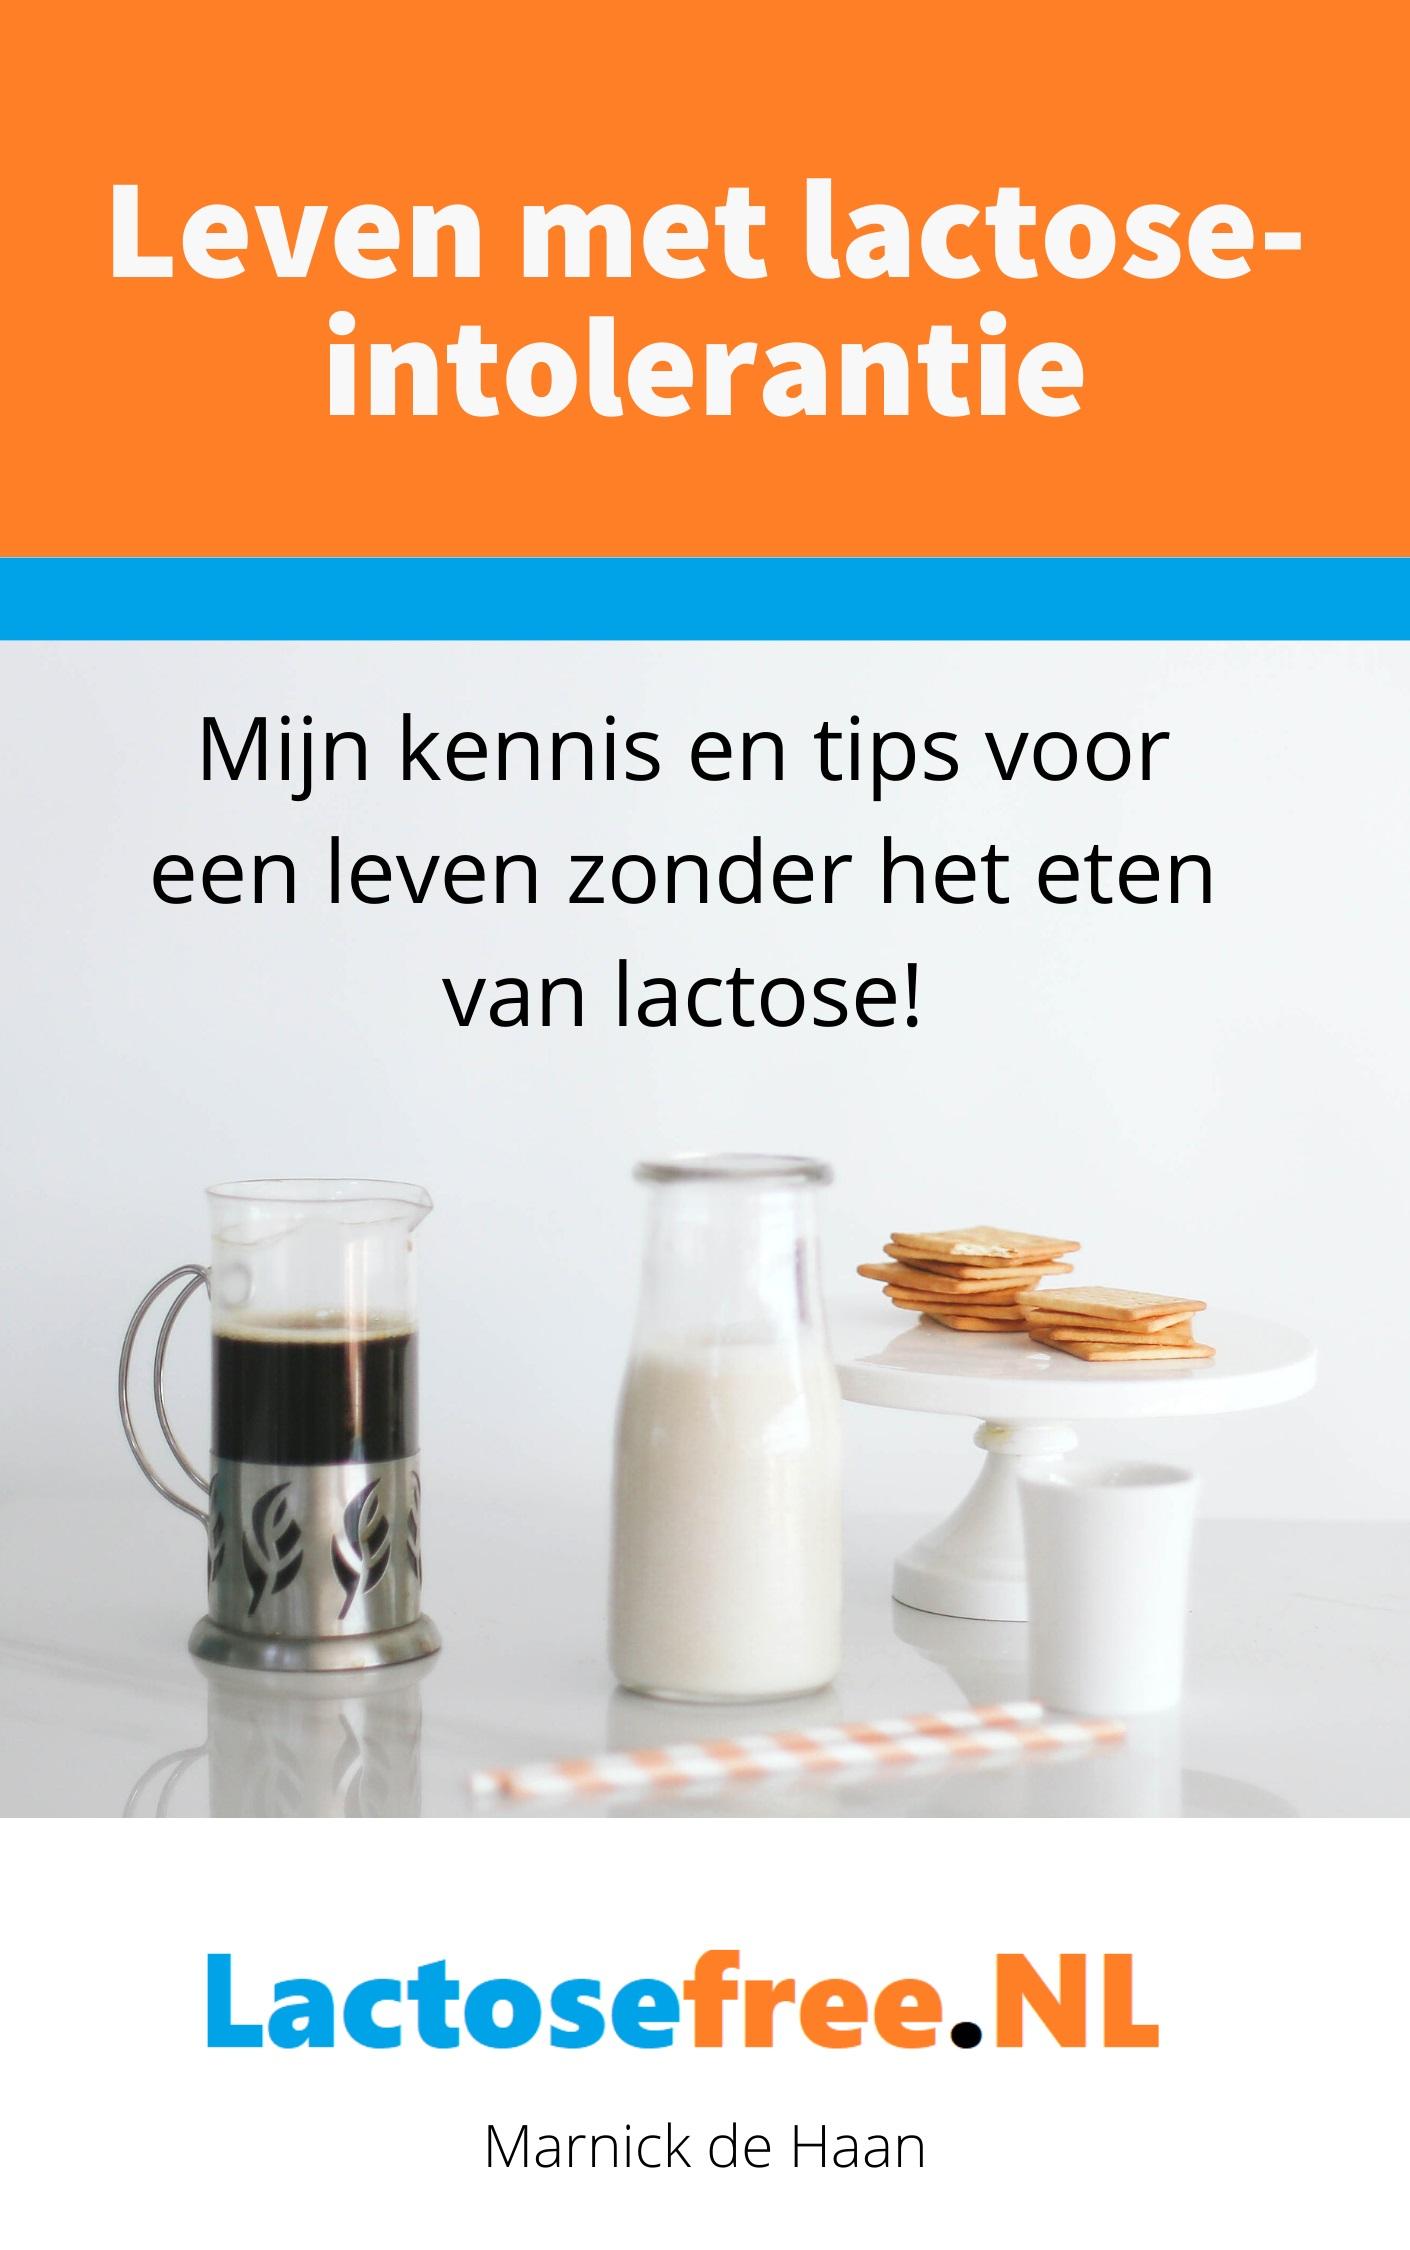 Lactose-vrij-leven-met-lactosefree.nl-cover